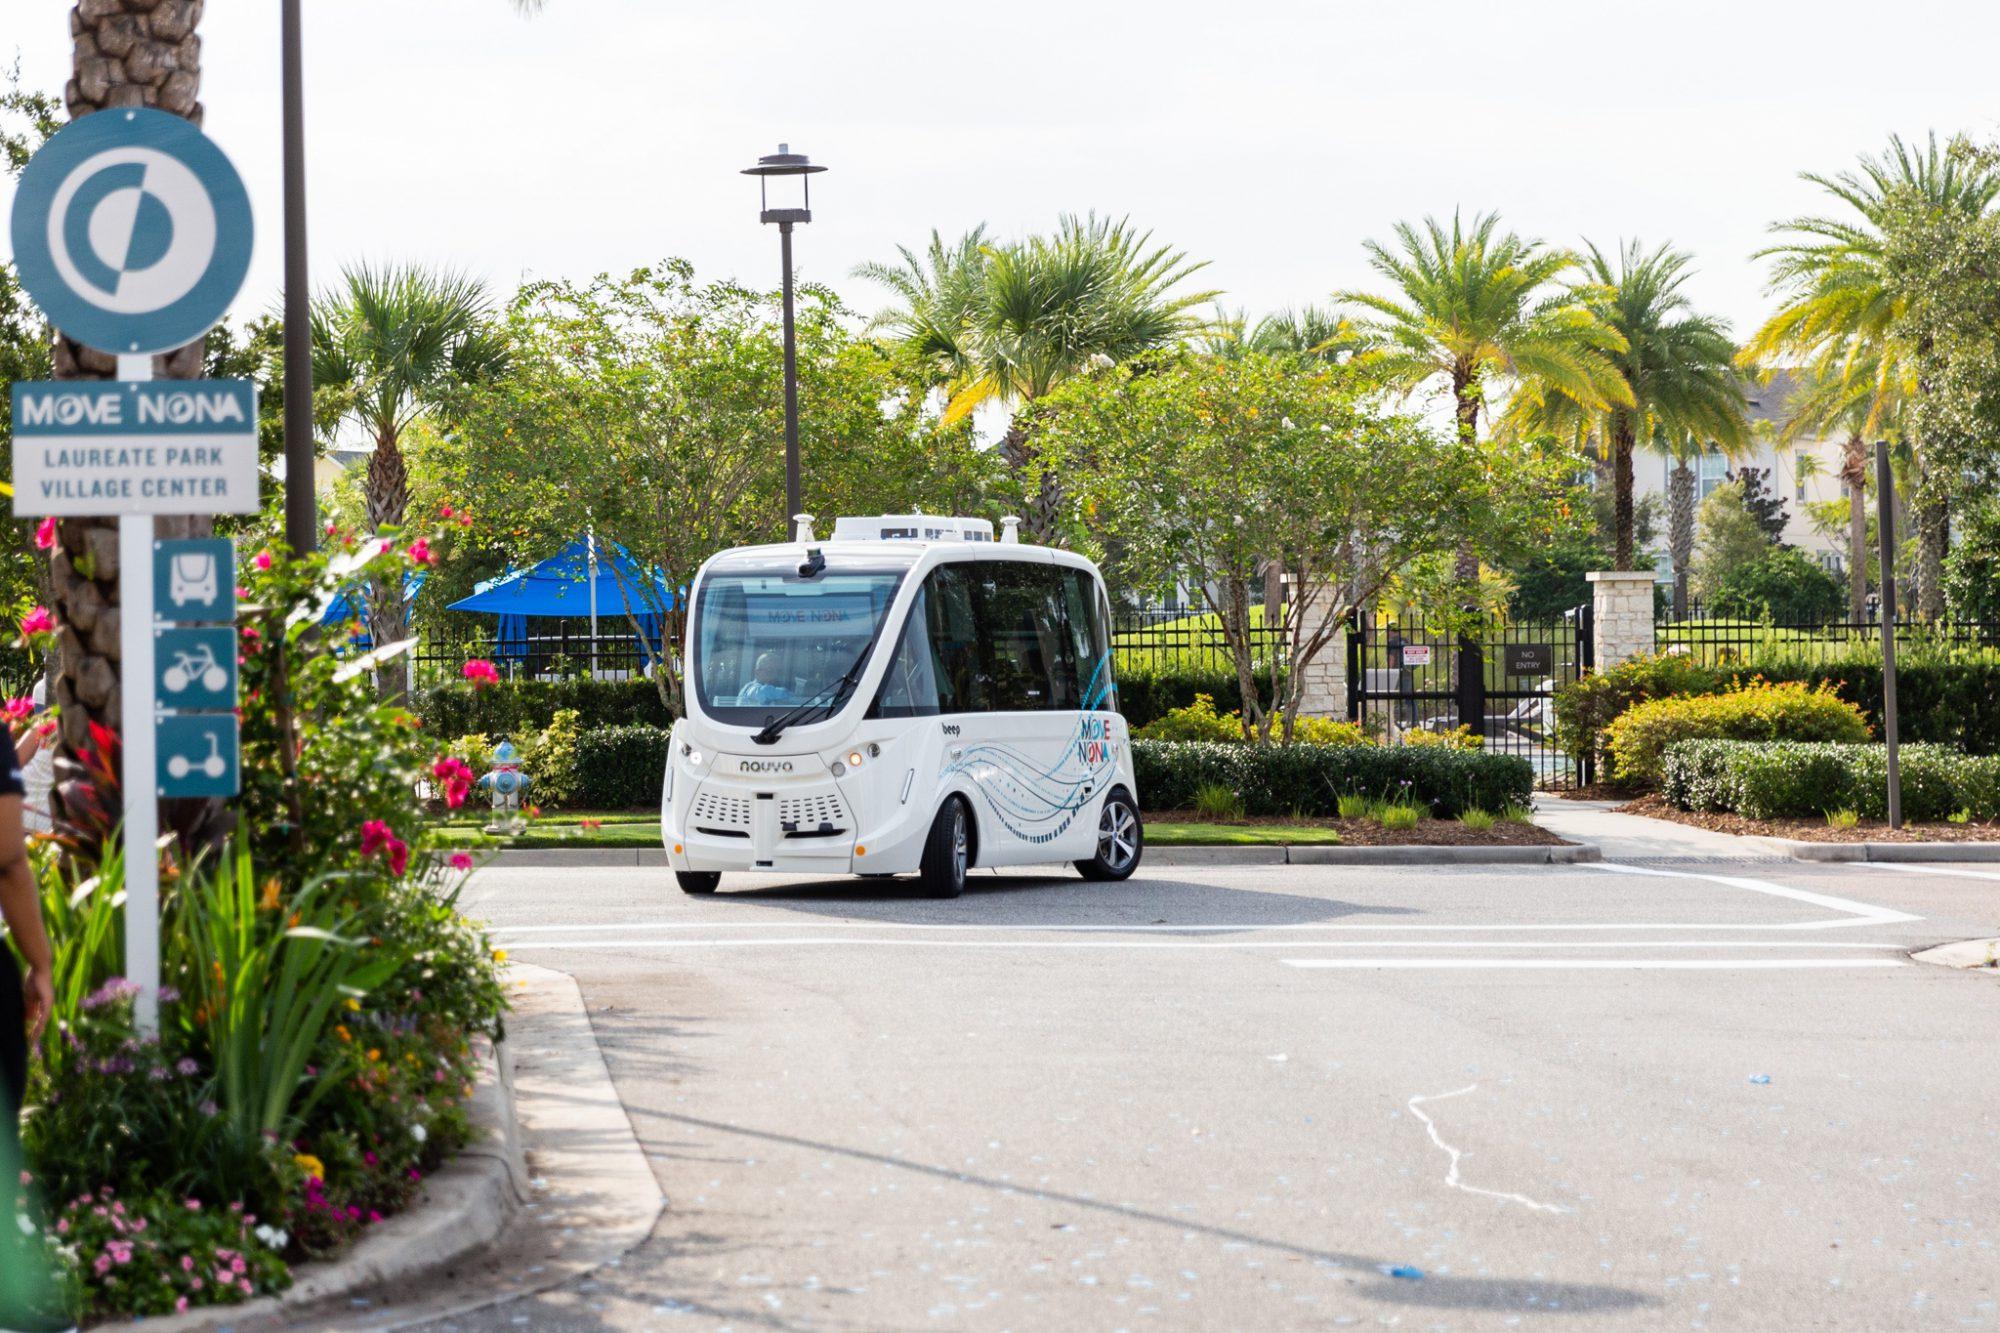 Beep Autonomous Vehicles: Move Nona 6